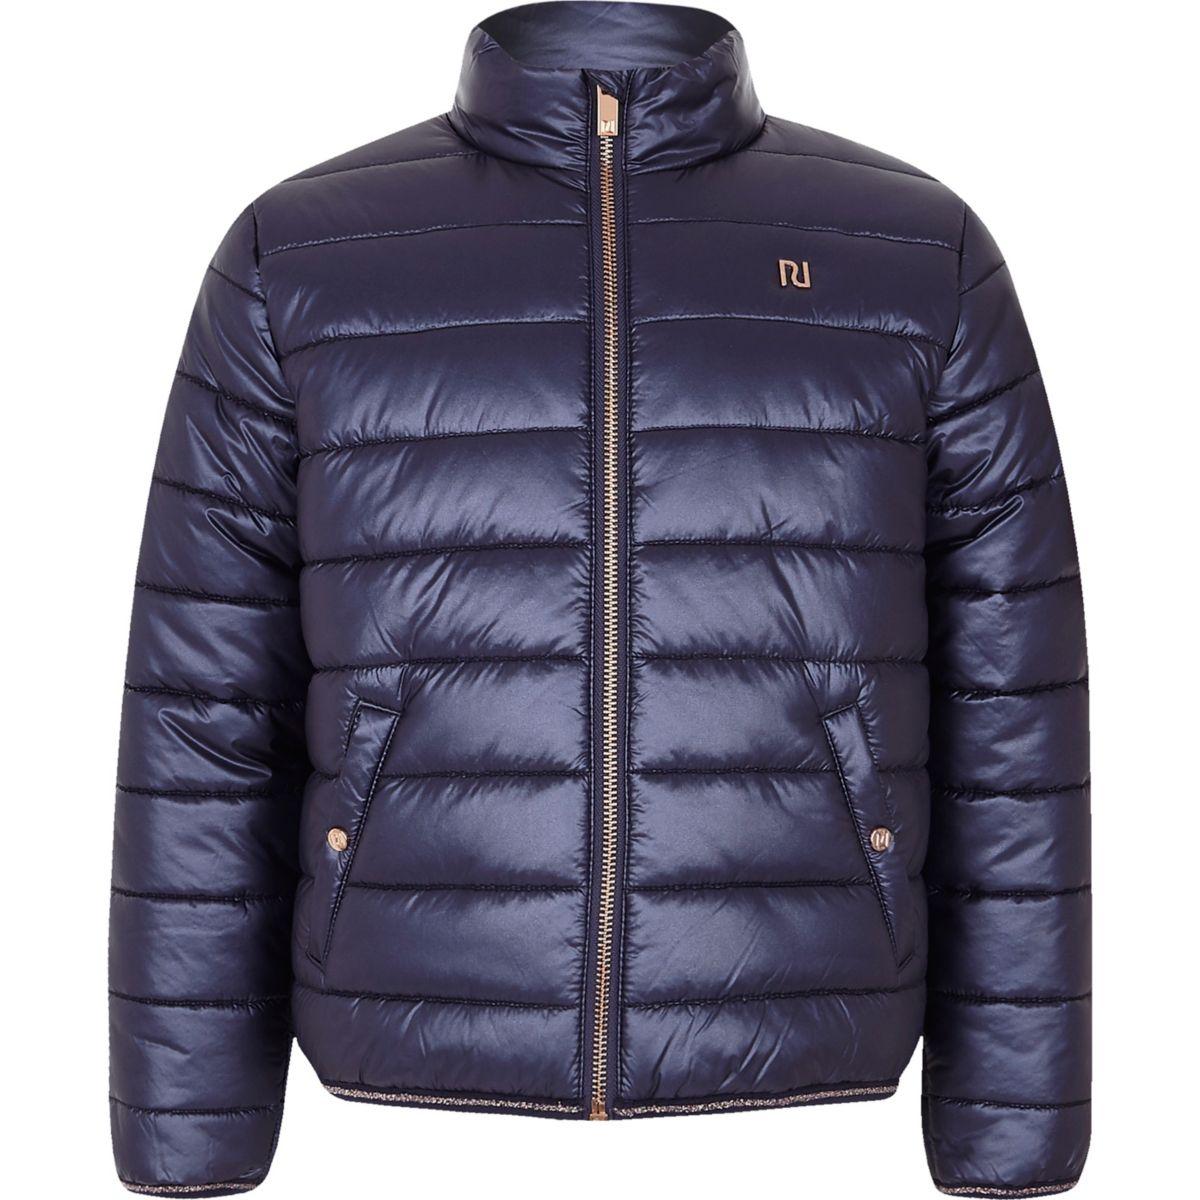 Girls navy bomber jacket